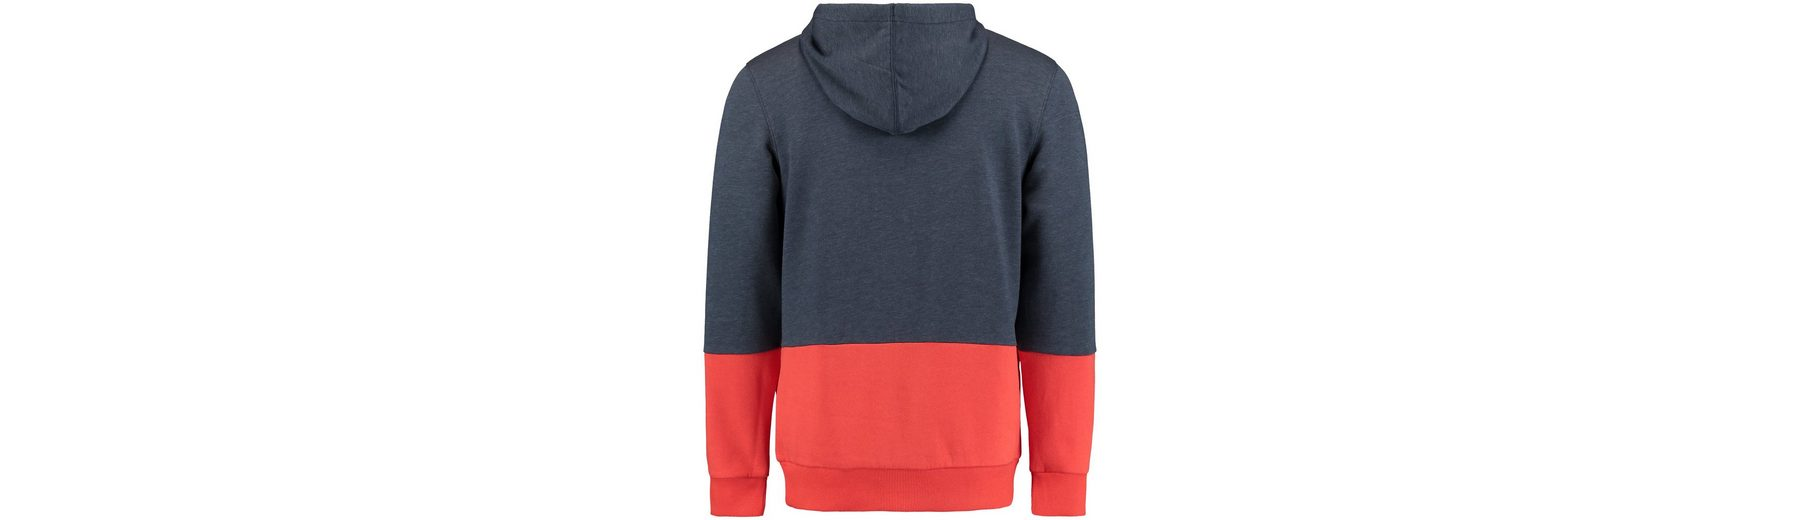 O'Neill Kapuzensweatshirt Colorblock Hoodie Verkauf Amazon Finden Große Online kgzjCoG2v